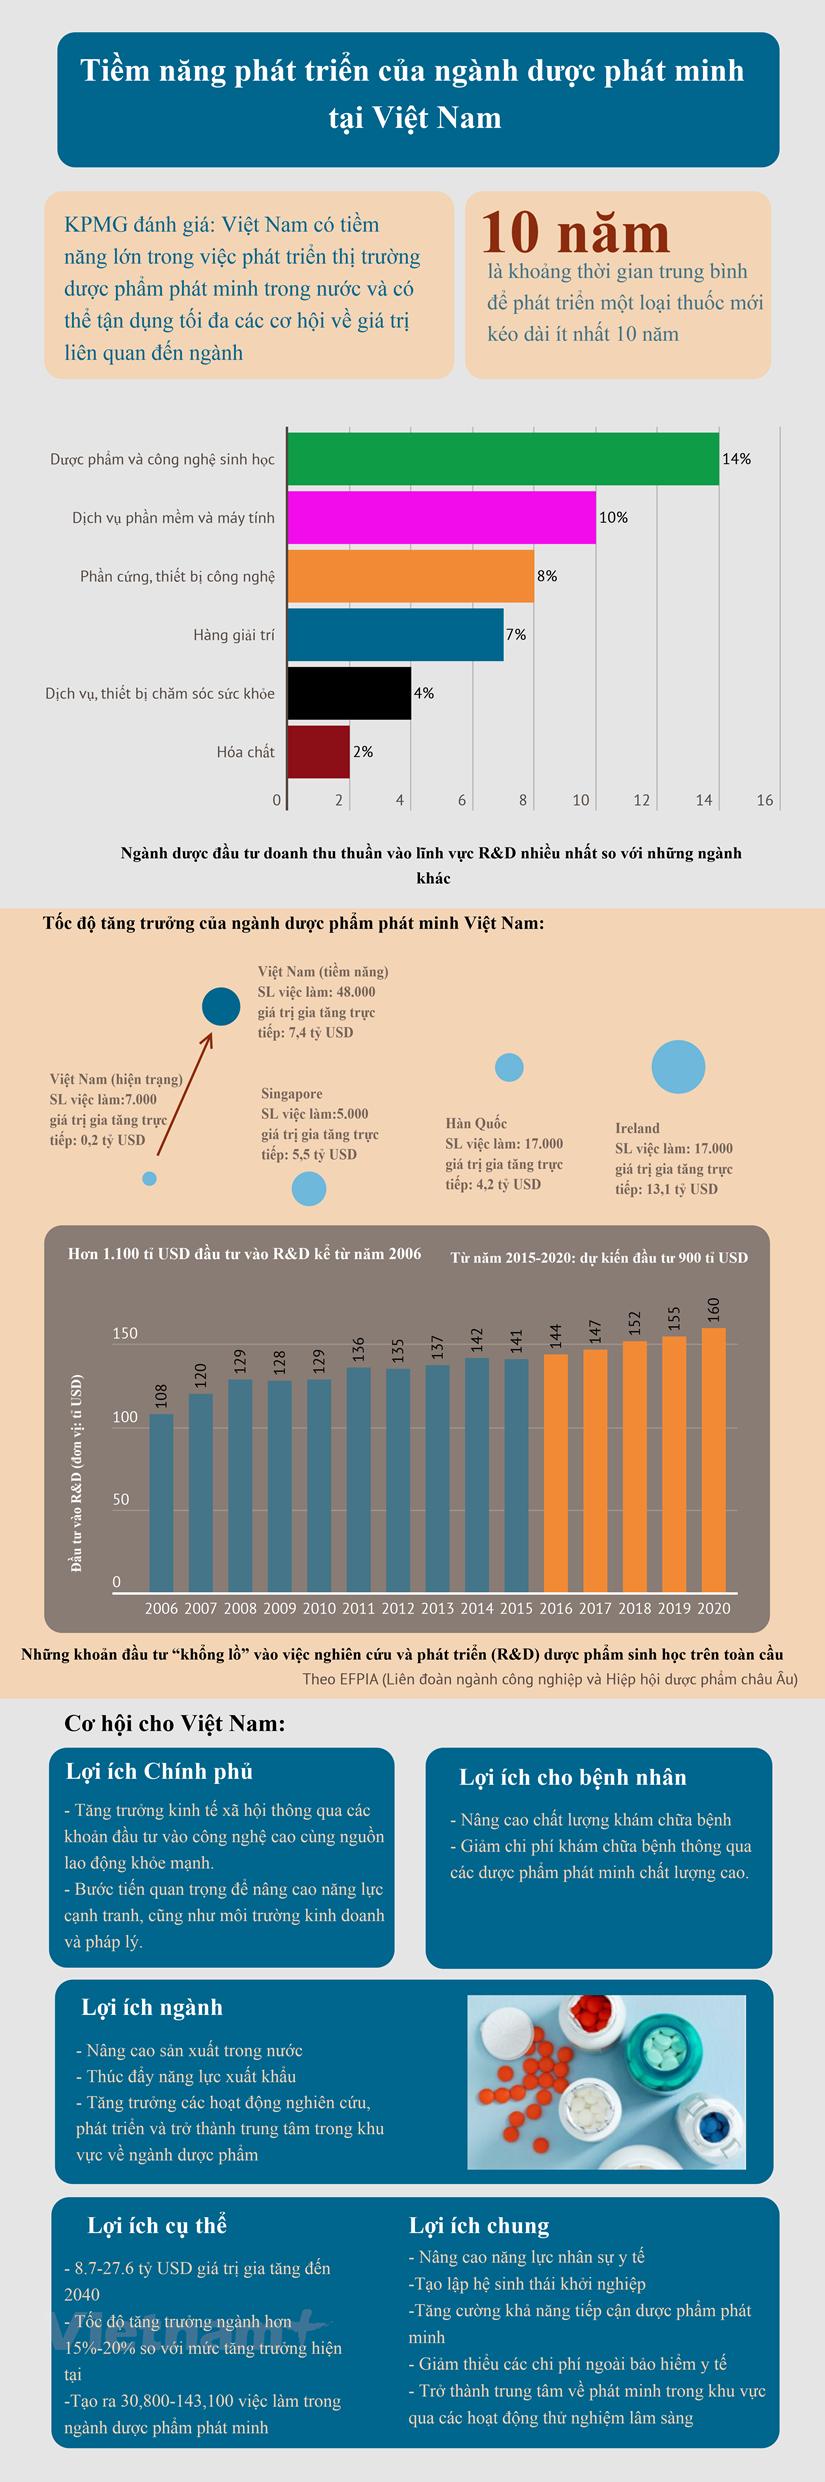 [Infographic] Nganh duoc pham phat minh Viet Nam nhieu tiem nang hinh anh 1